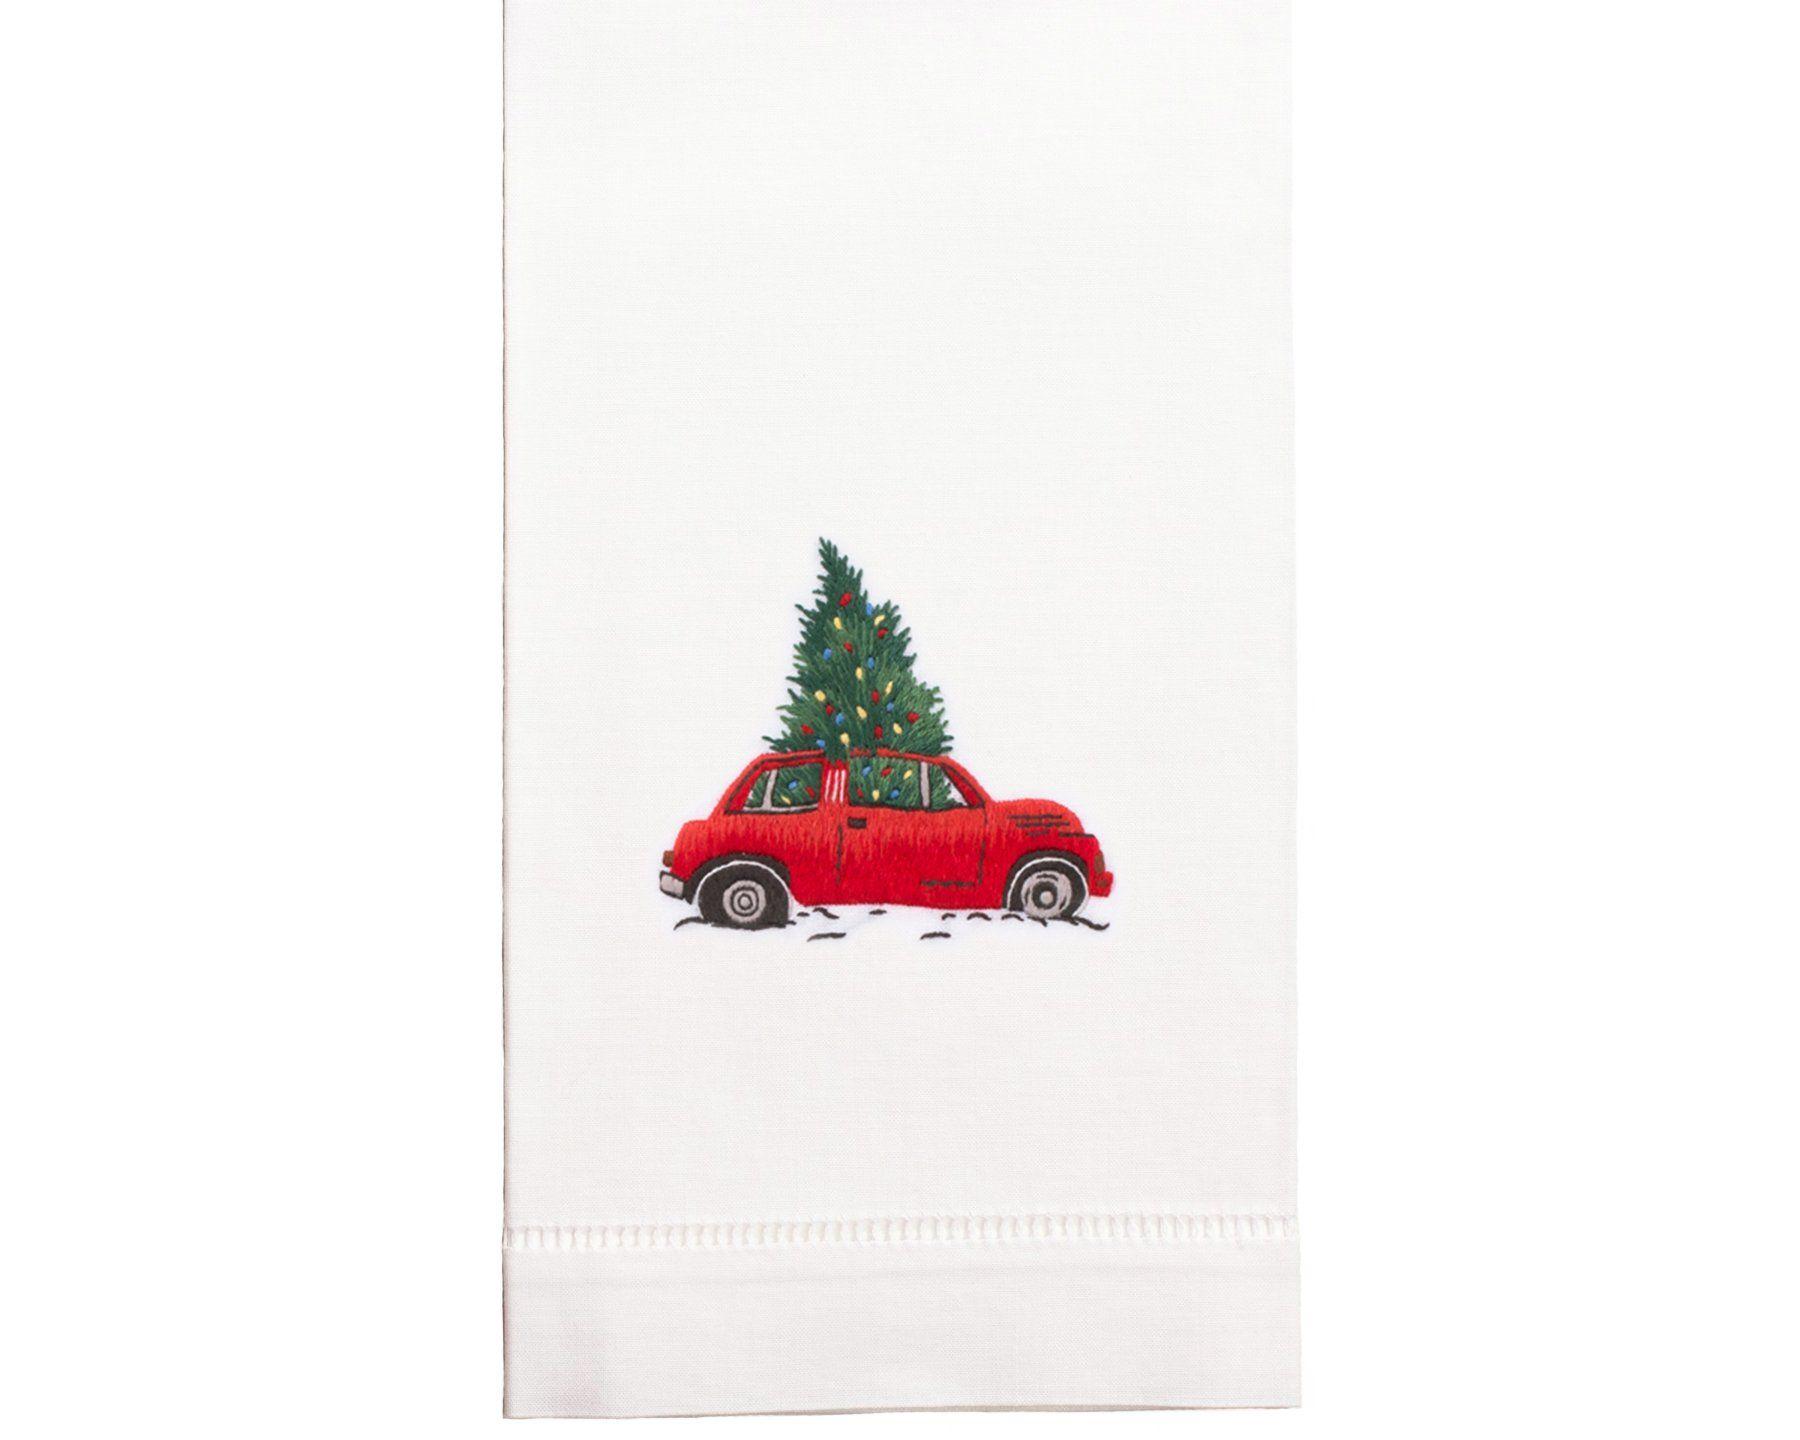 Hand Embroidered Christmas Towel - No thank you